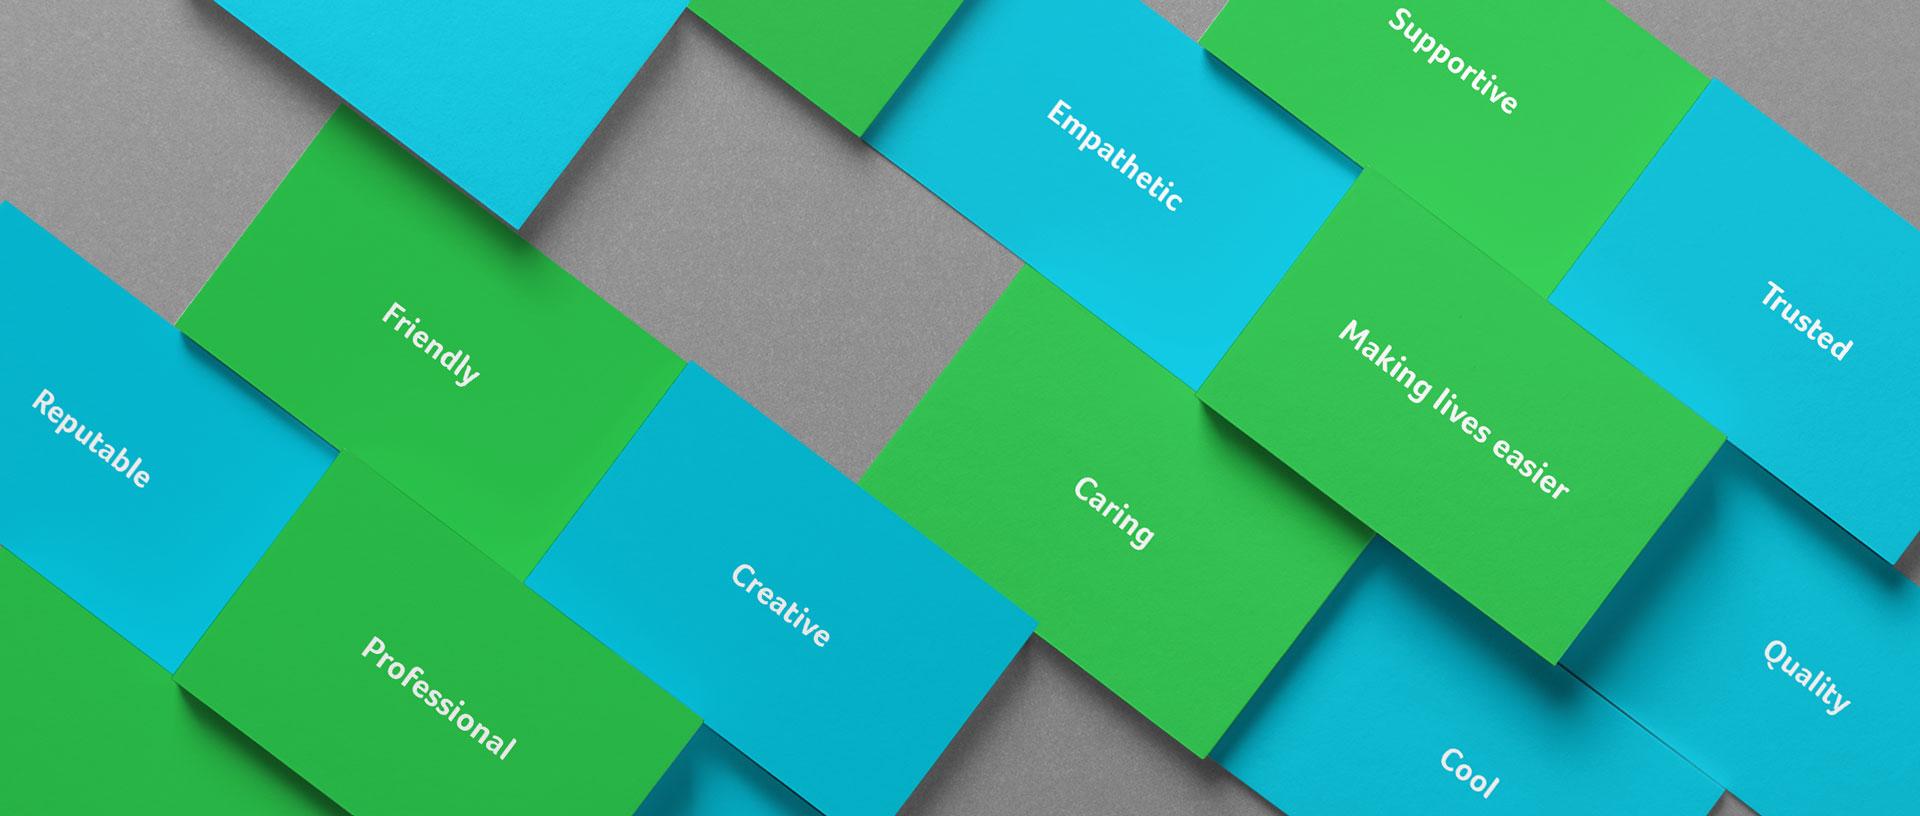 attributes-mission-statement-creation